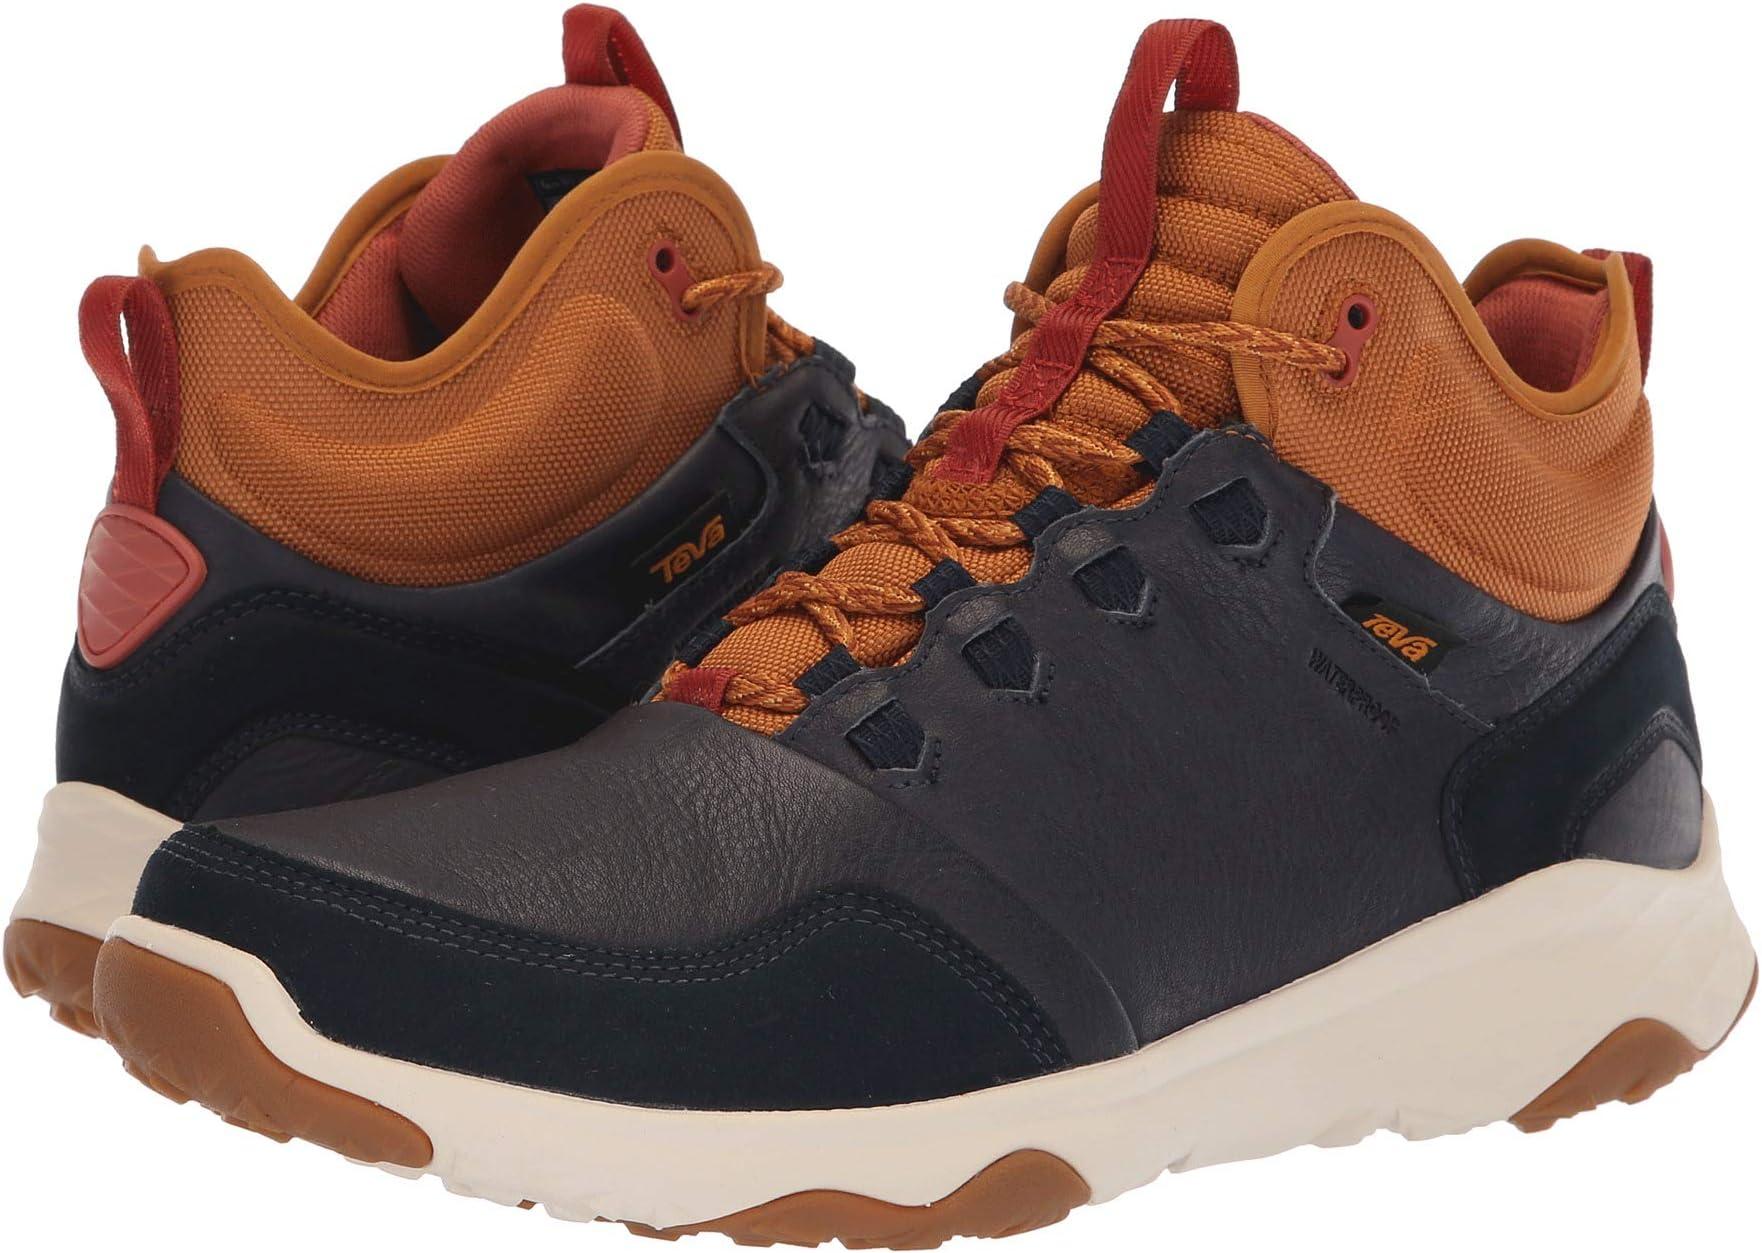 b75e4deed75619 Teva Sandals